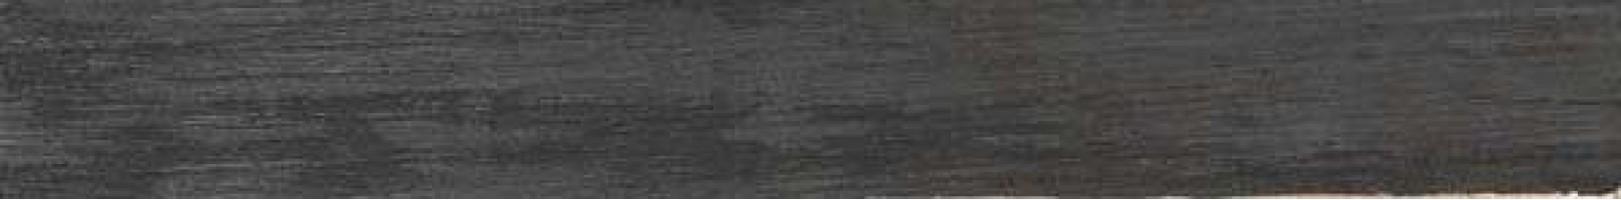 Плинтус Cir Ceramiche Saint Barth Bucaniere 7.5x60.8 1040085